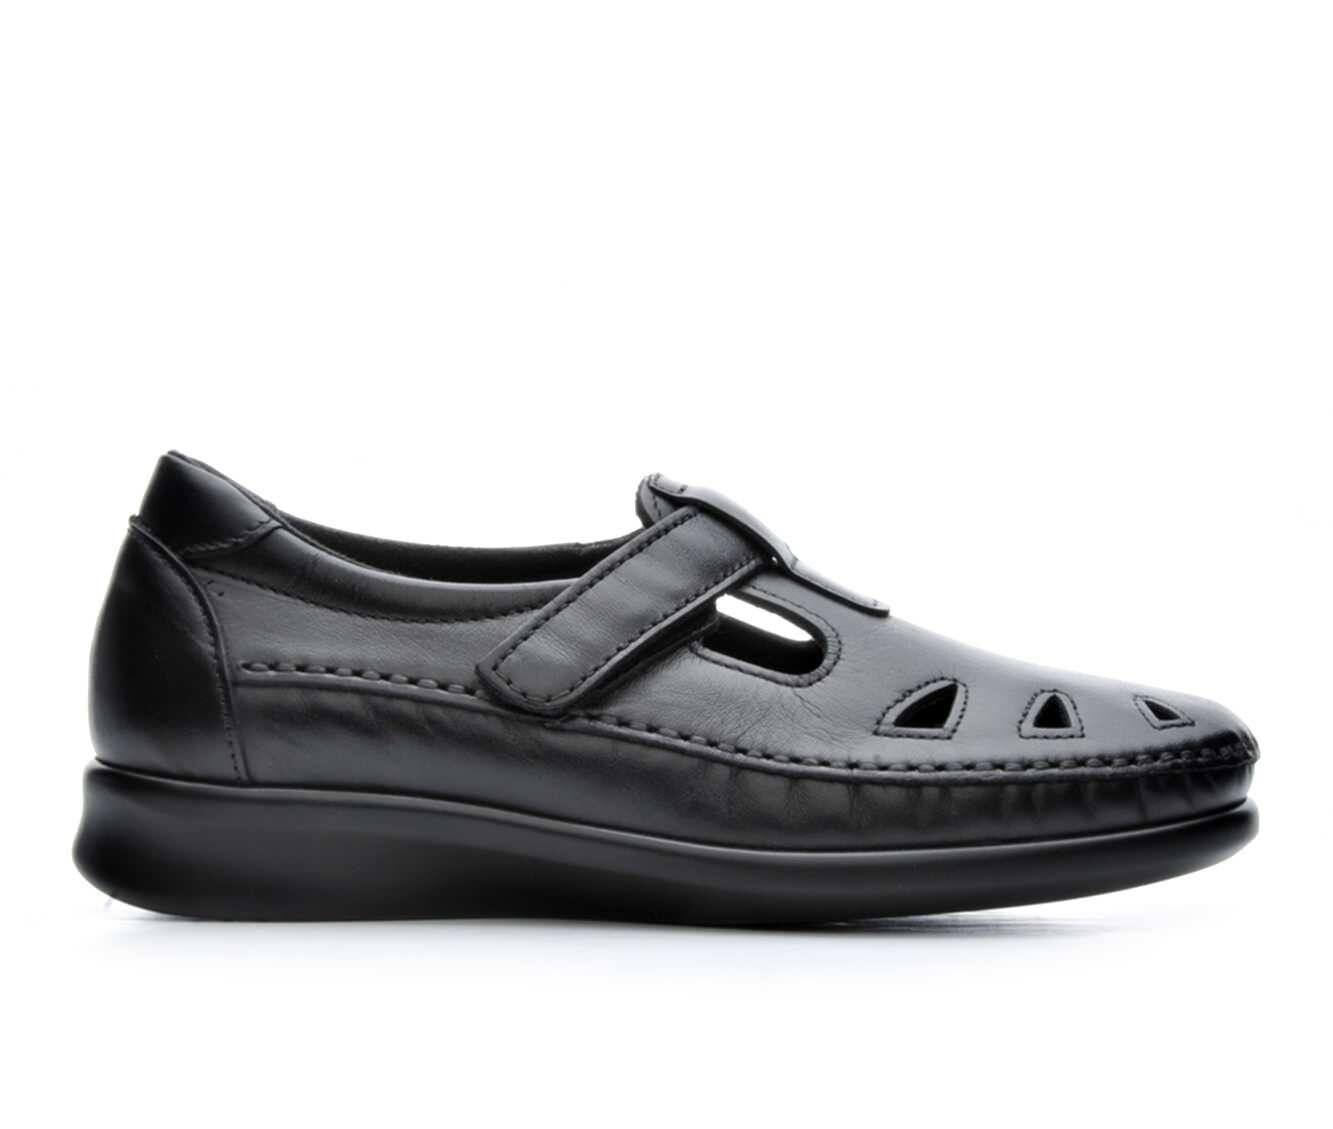 get cheap Women's Sas Roamer Comfort Shoes Black